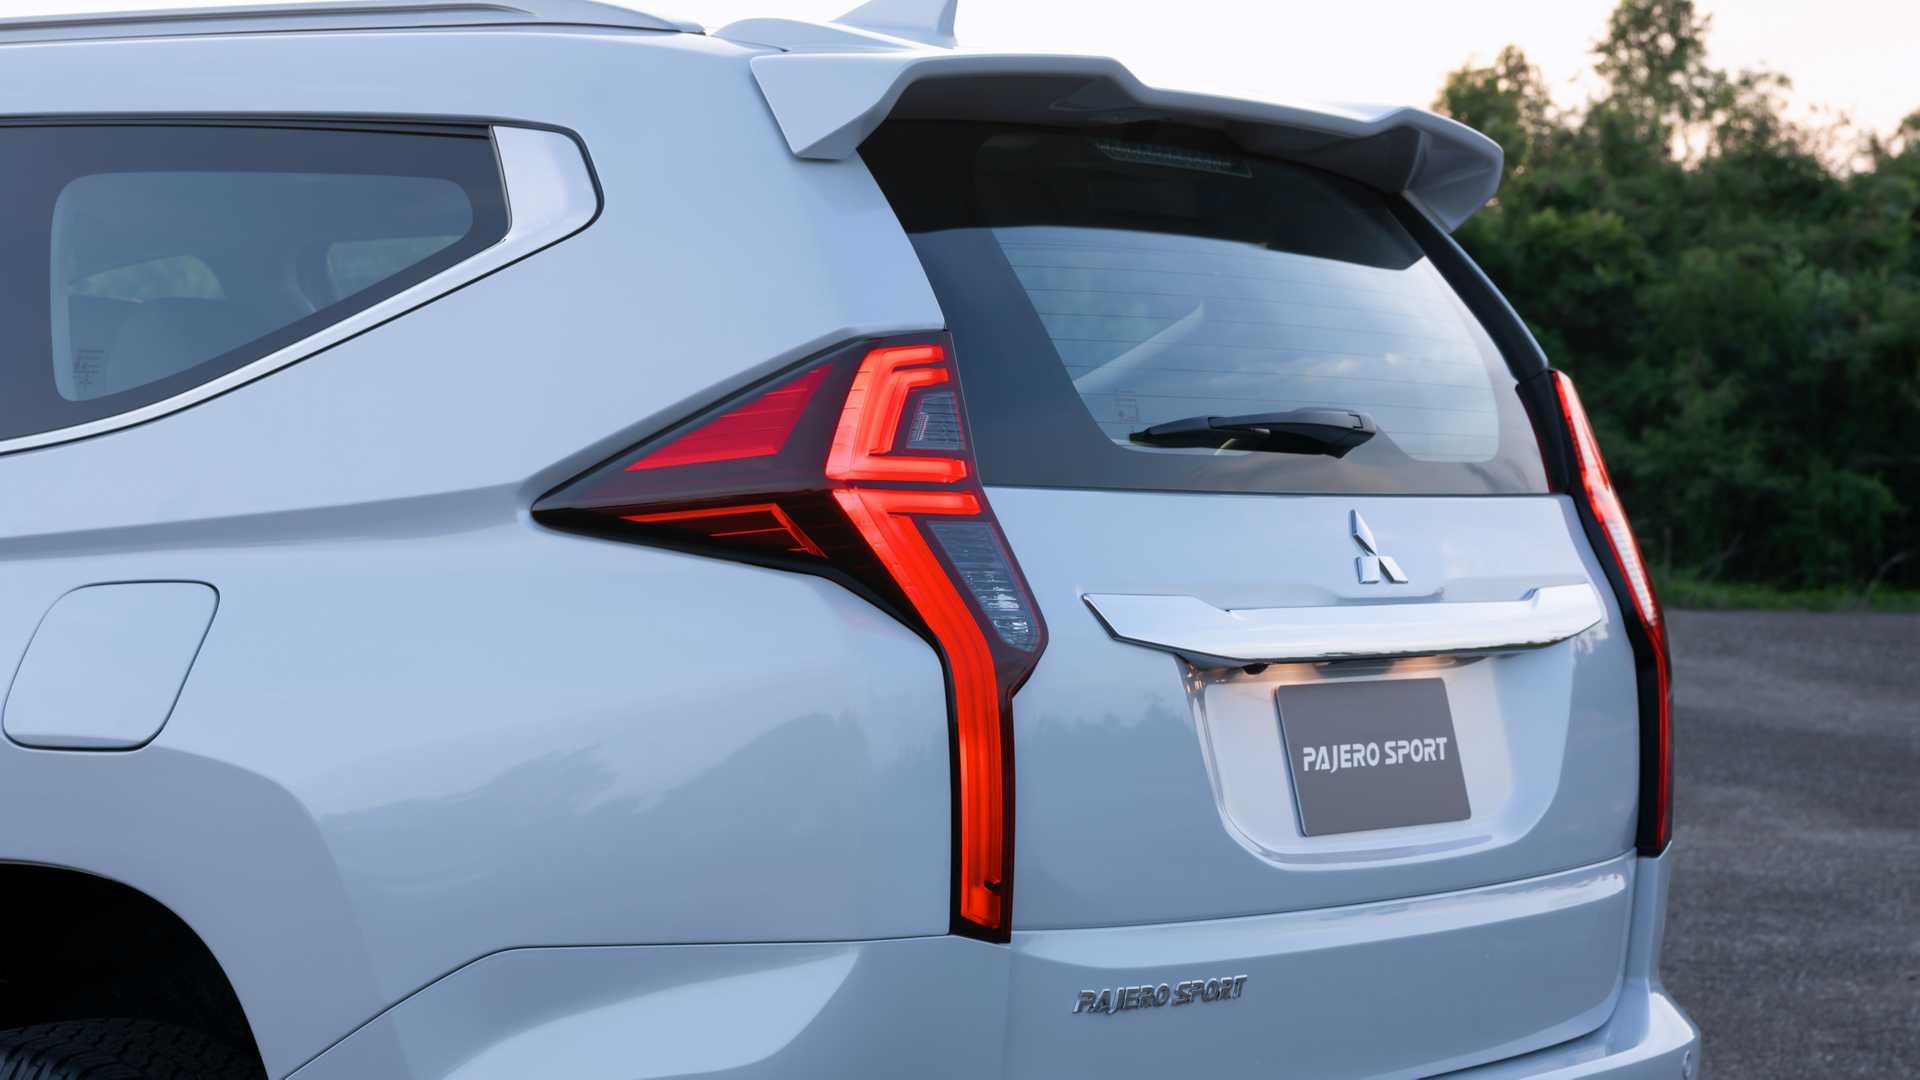 2020_Mitsubishi_Pajero_Sport_facelift_0028